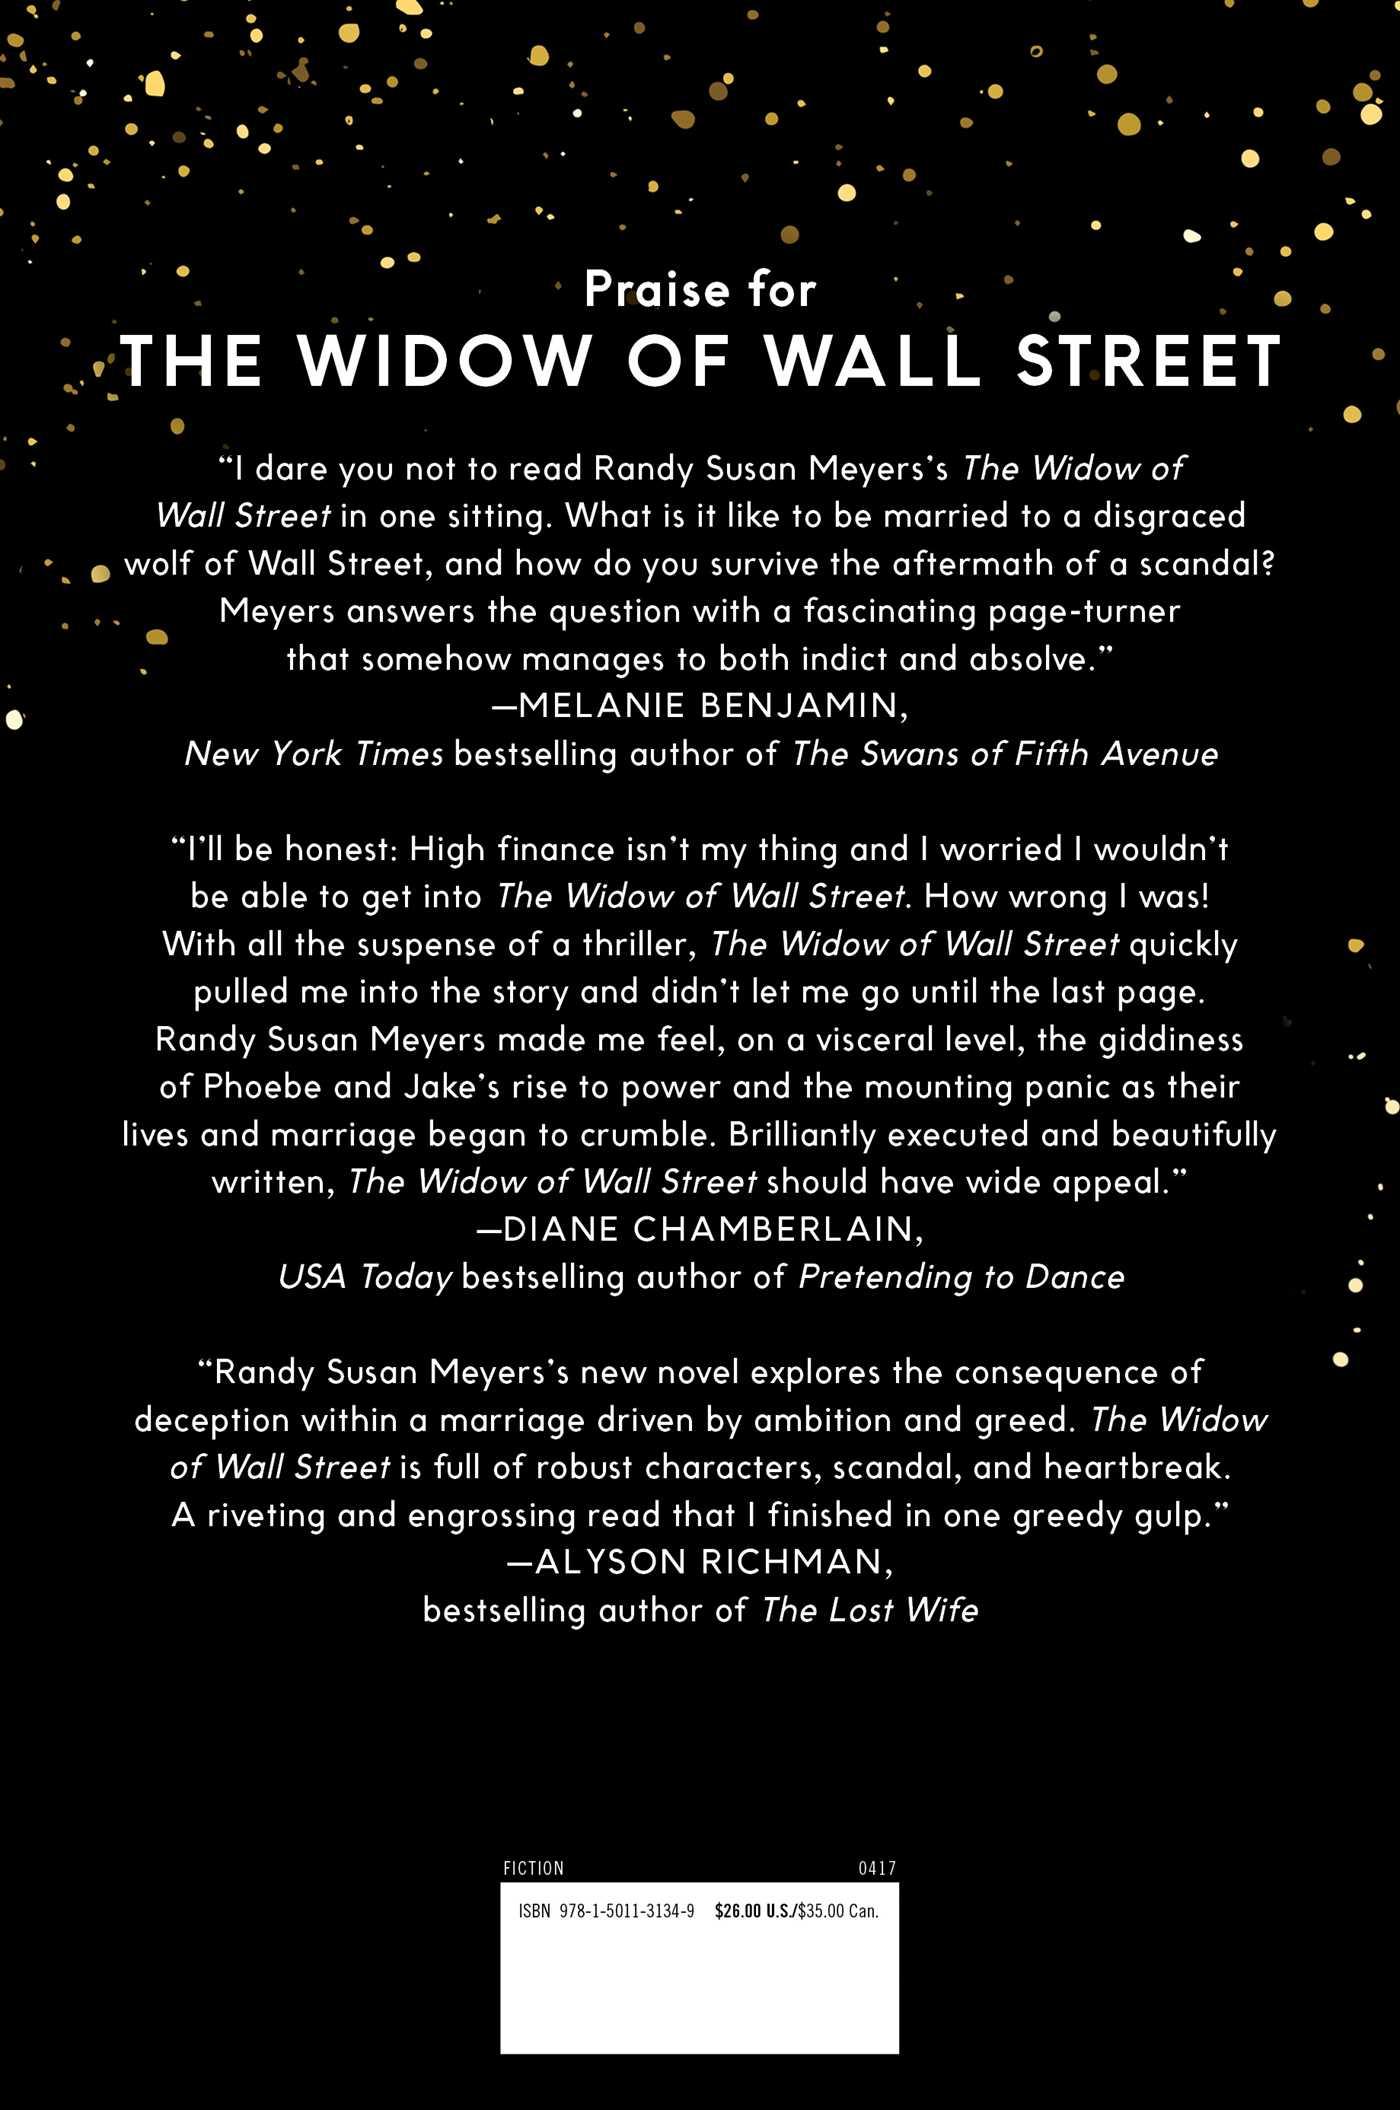 The widow of wall street 9781501131349 hr back